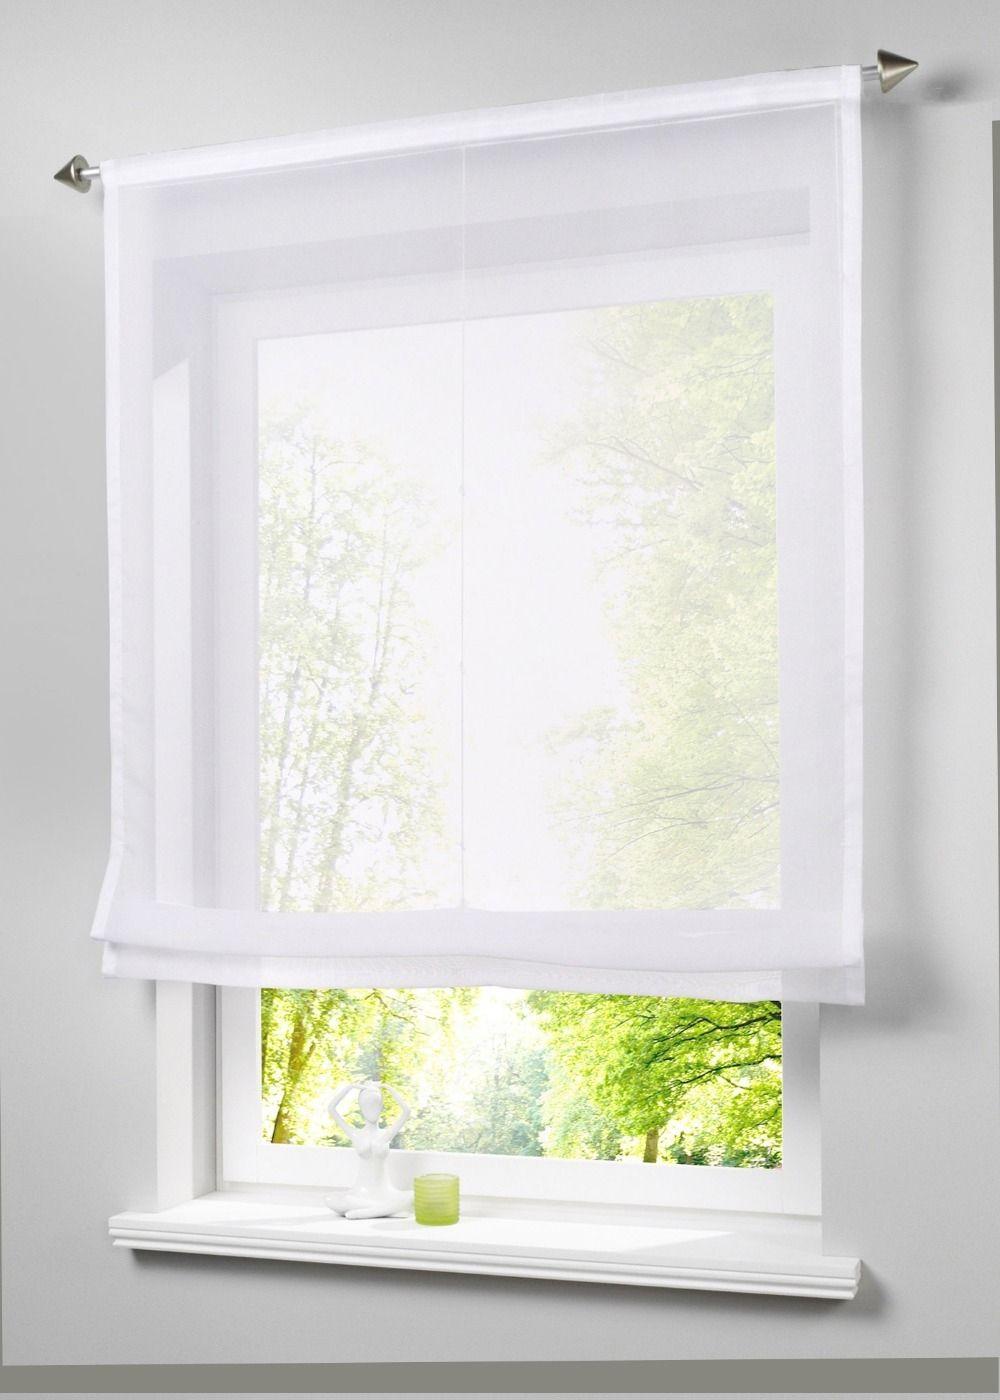 Sheer curtains kitchen windows realtagfo pinterest